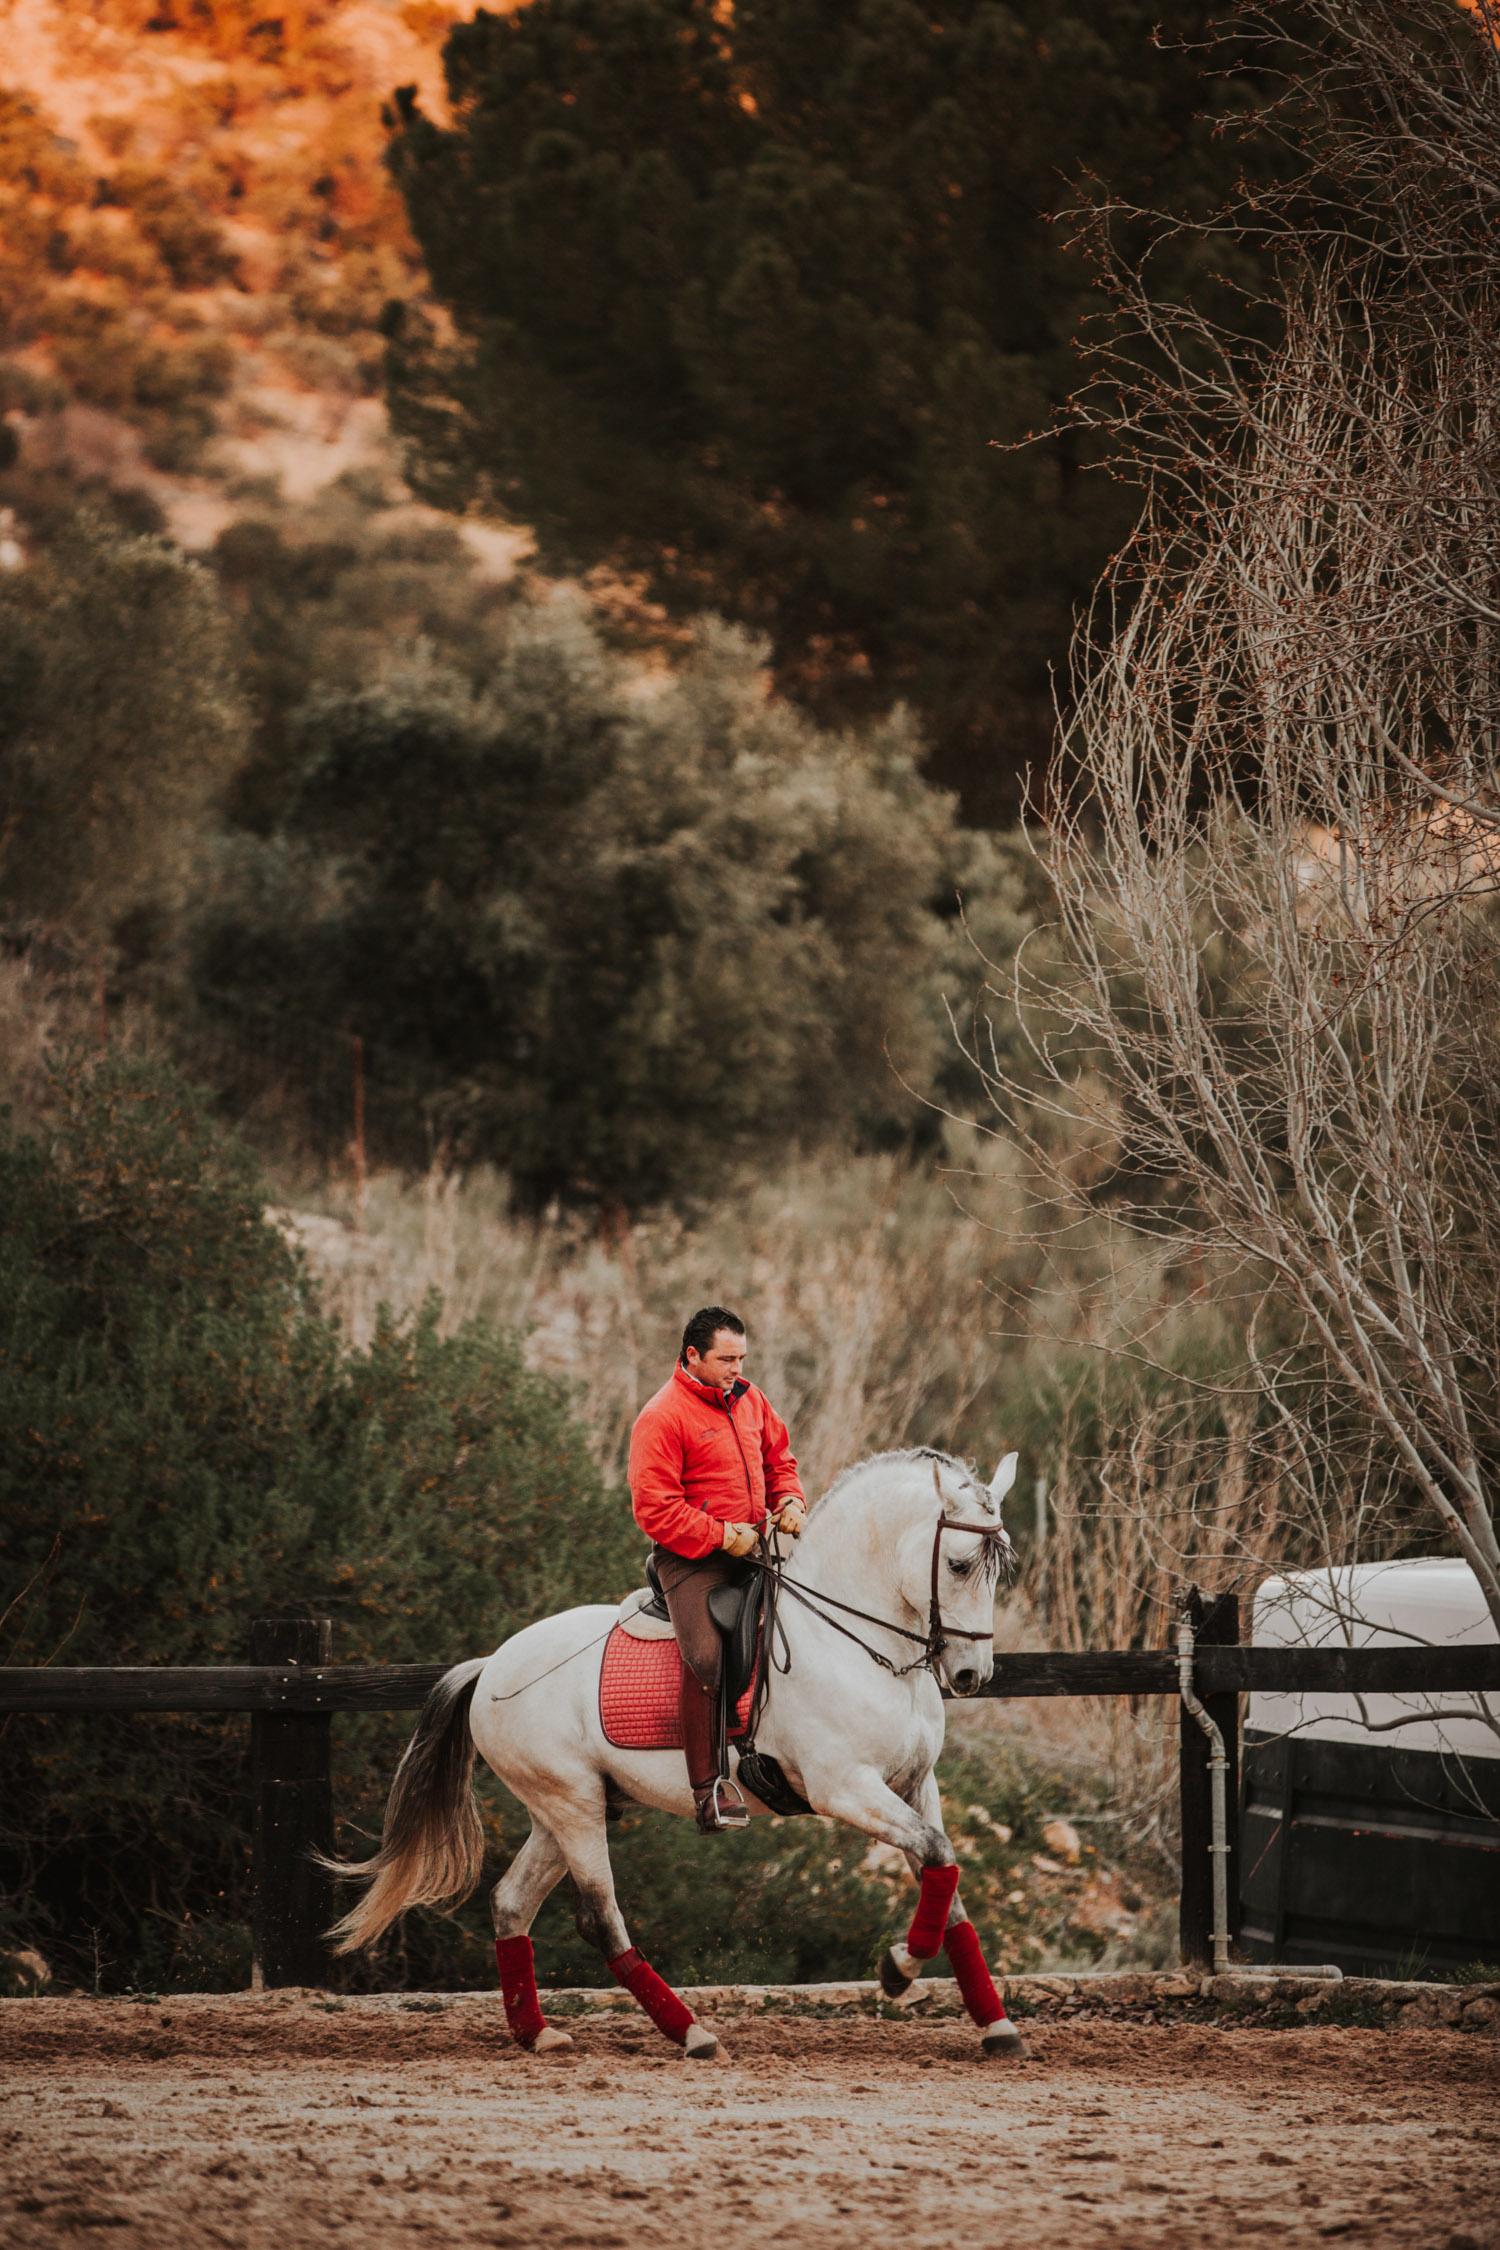 Pferdefotografin Pferdeshooting Pferdefotos Pferdefotografie Workshop Coaching Kurs Bildbearbeitung Photoshop Lightroom Schweiz Tabitha Roth Ronda Spanien Andalusien